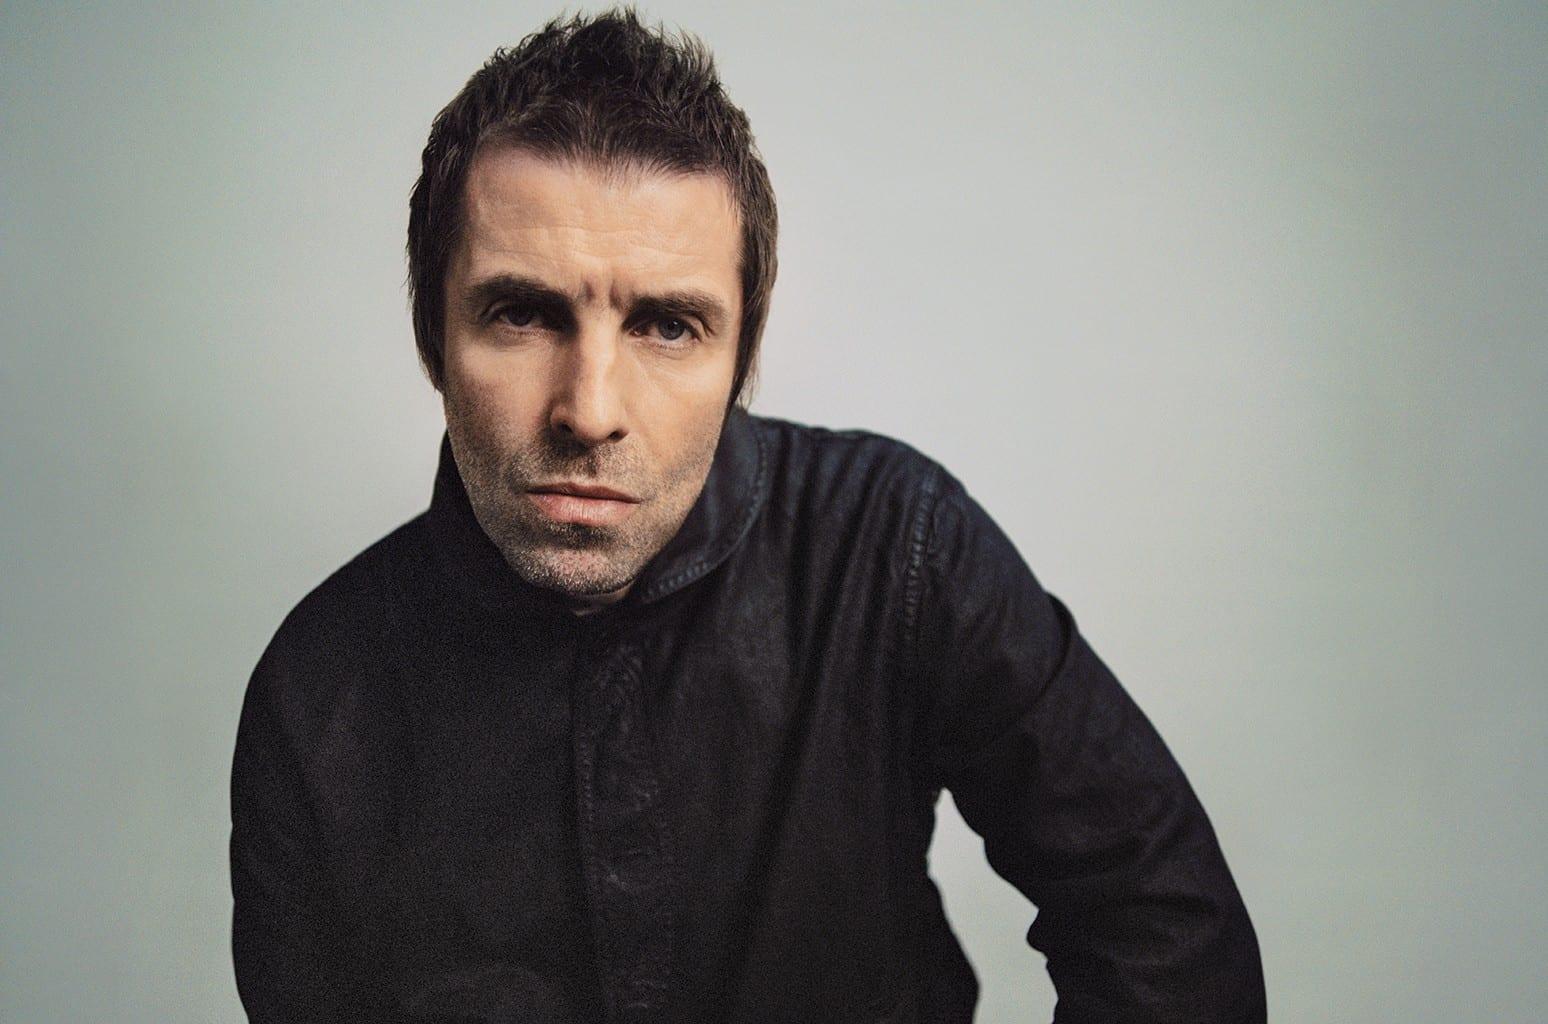 Liam Gallagher Divorce from Nicole Appleton